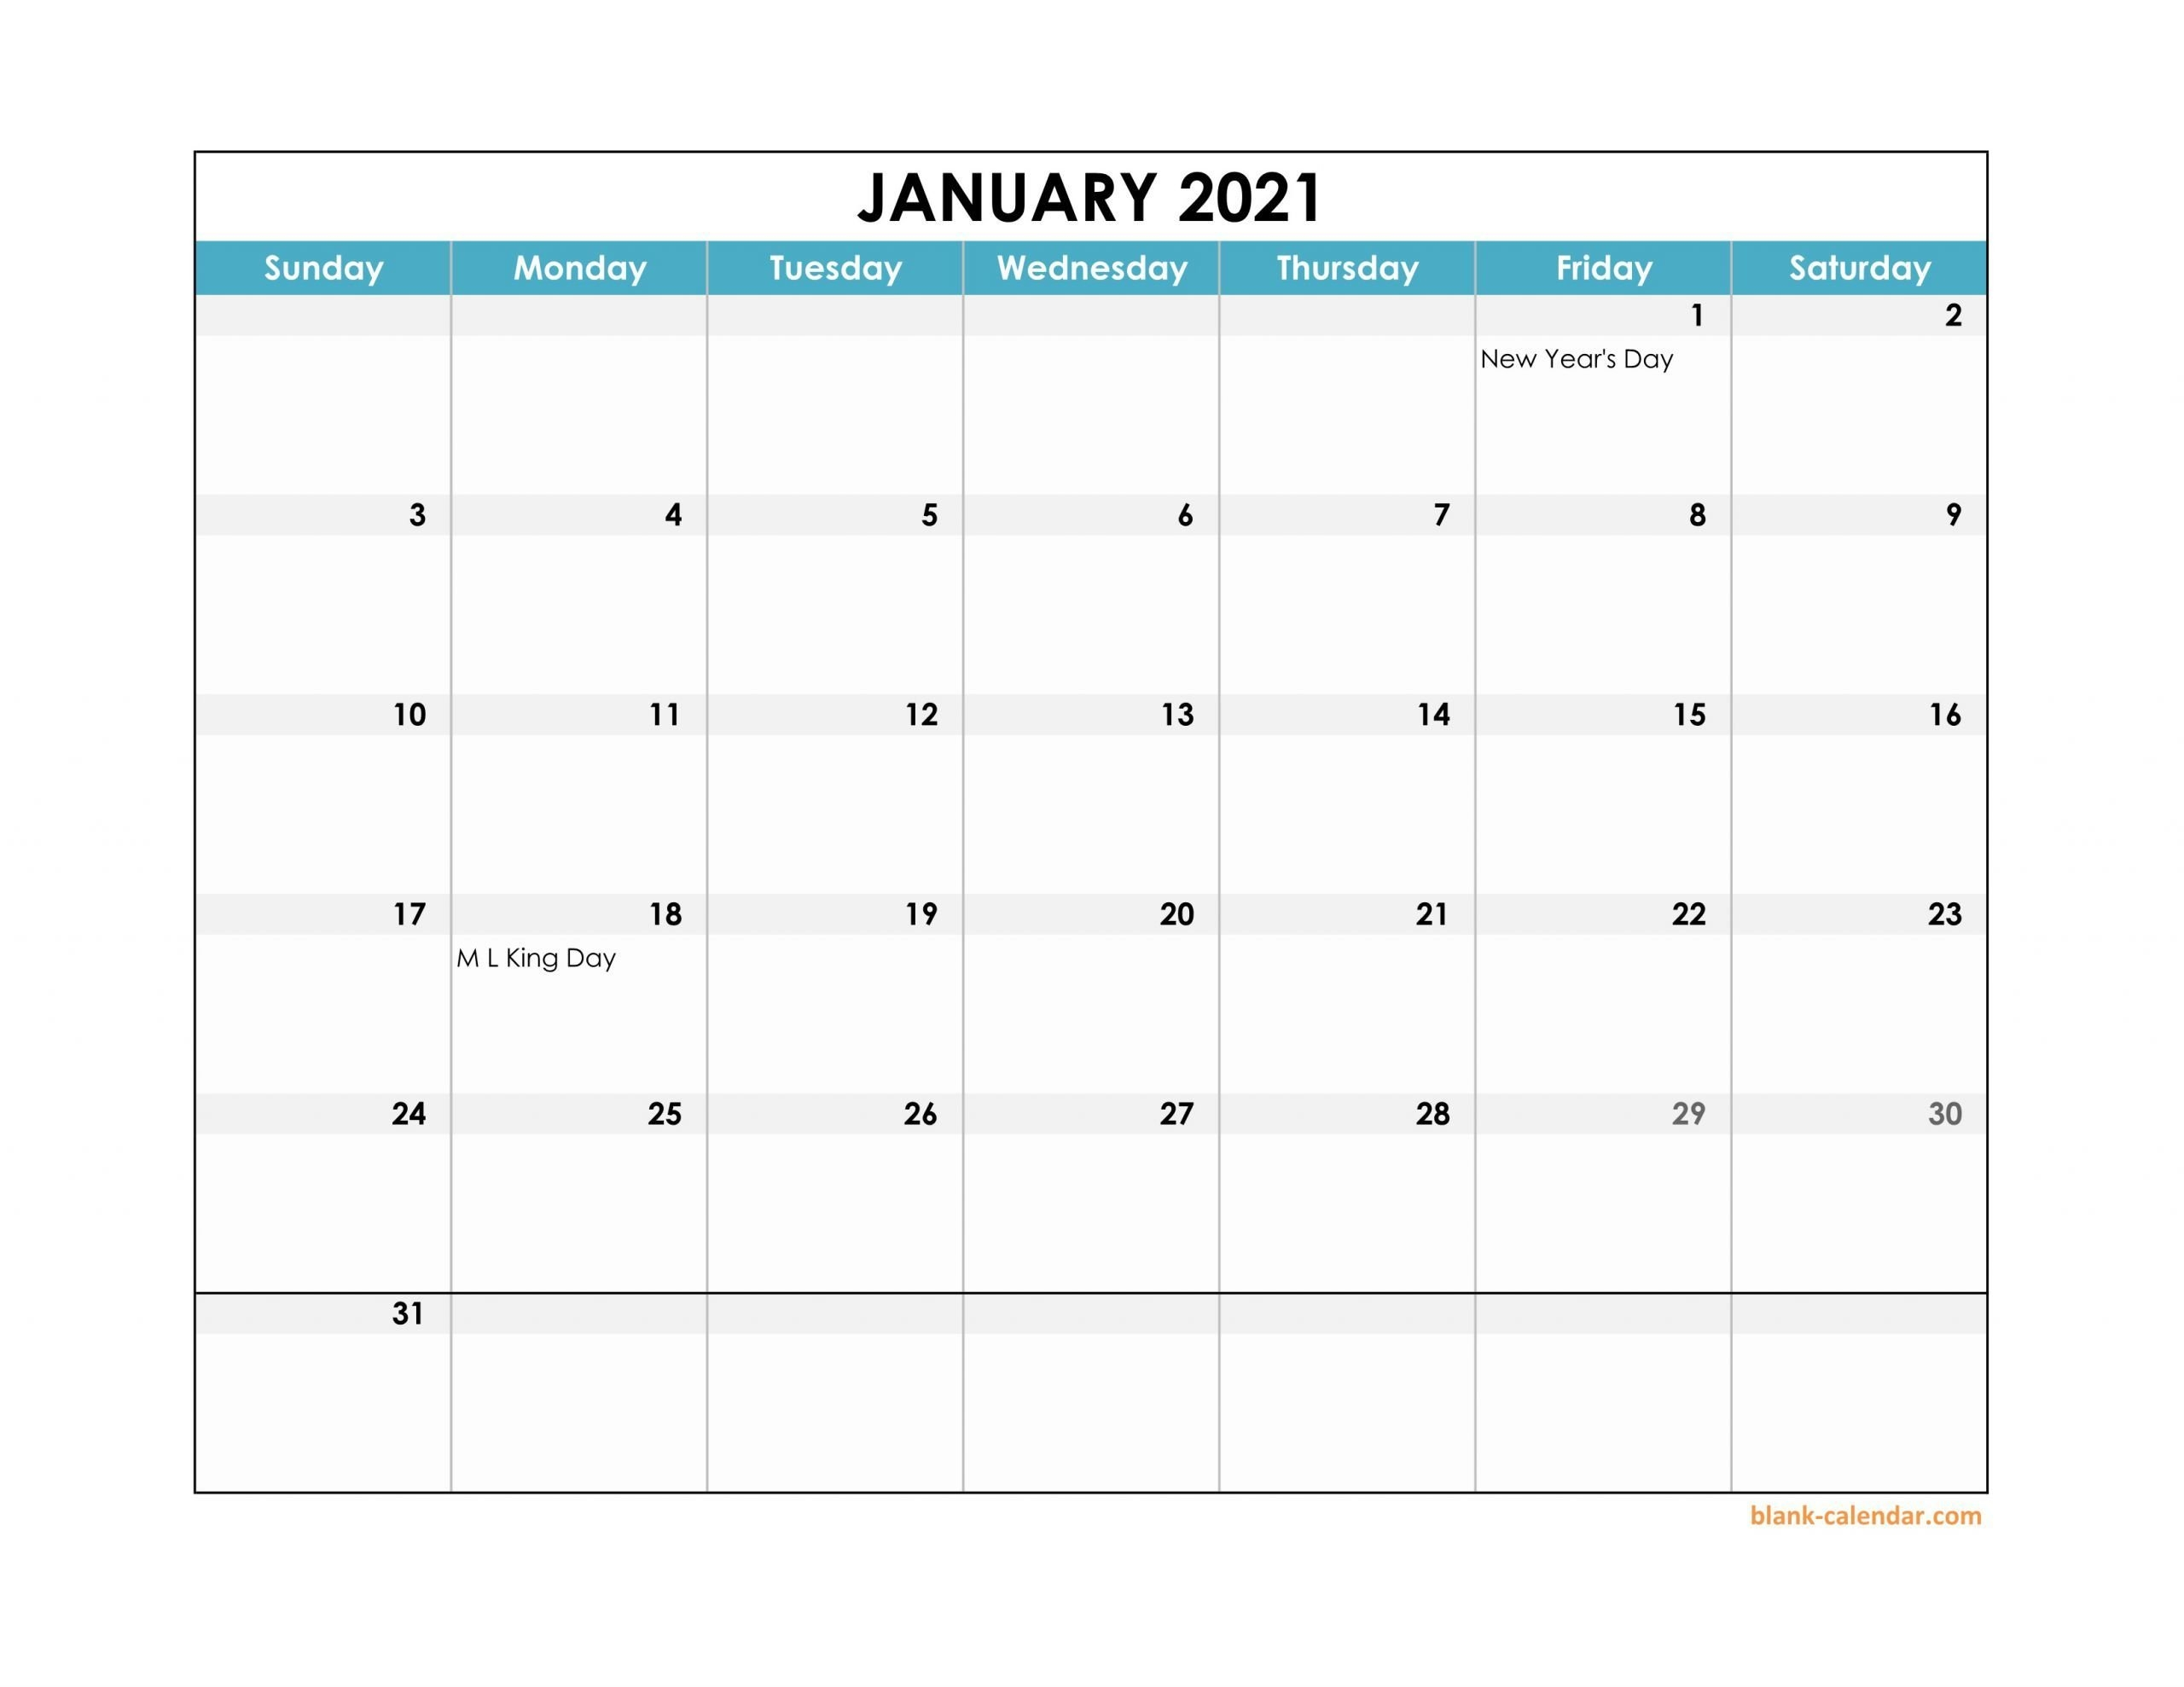 2021 Weekly Calendar Excel Free In 2020 | Printable Calendar Design, Excel Calendar, Excel intended for Microsoft Photo Calender 2021